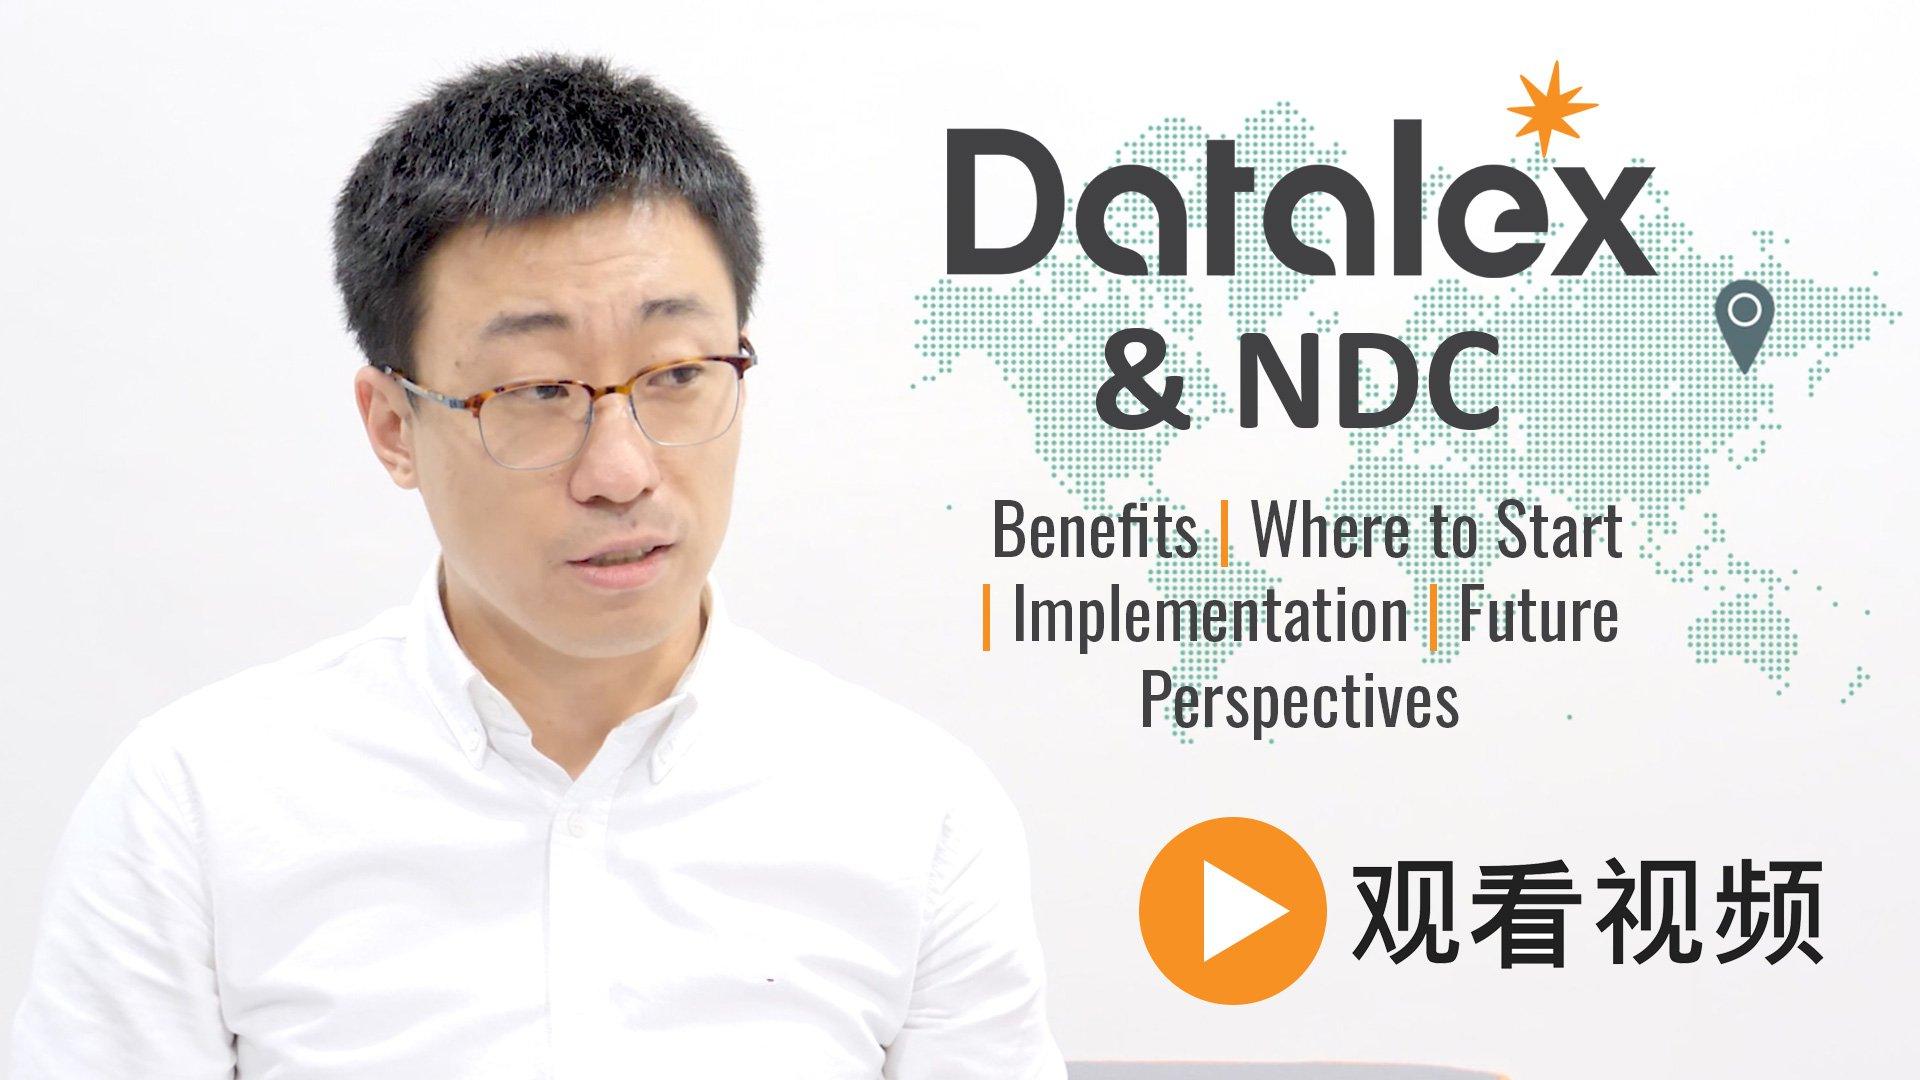 Datalex & NDC